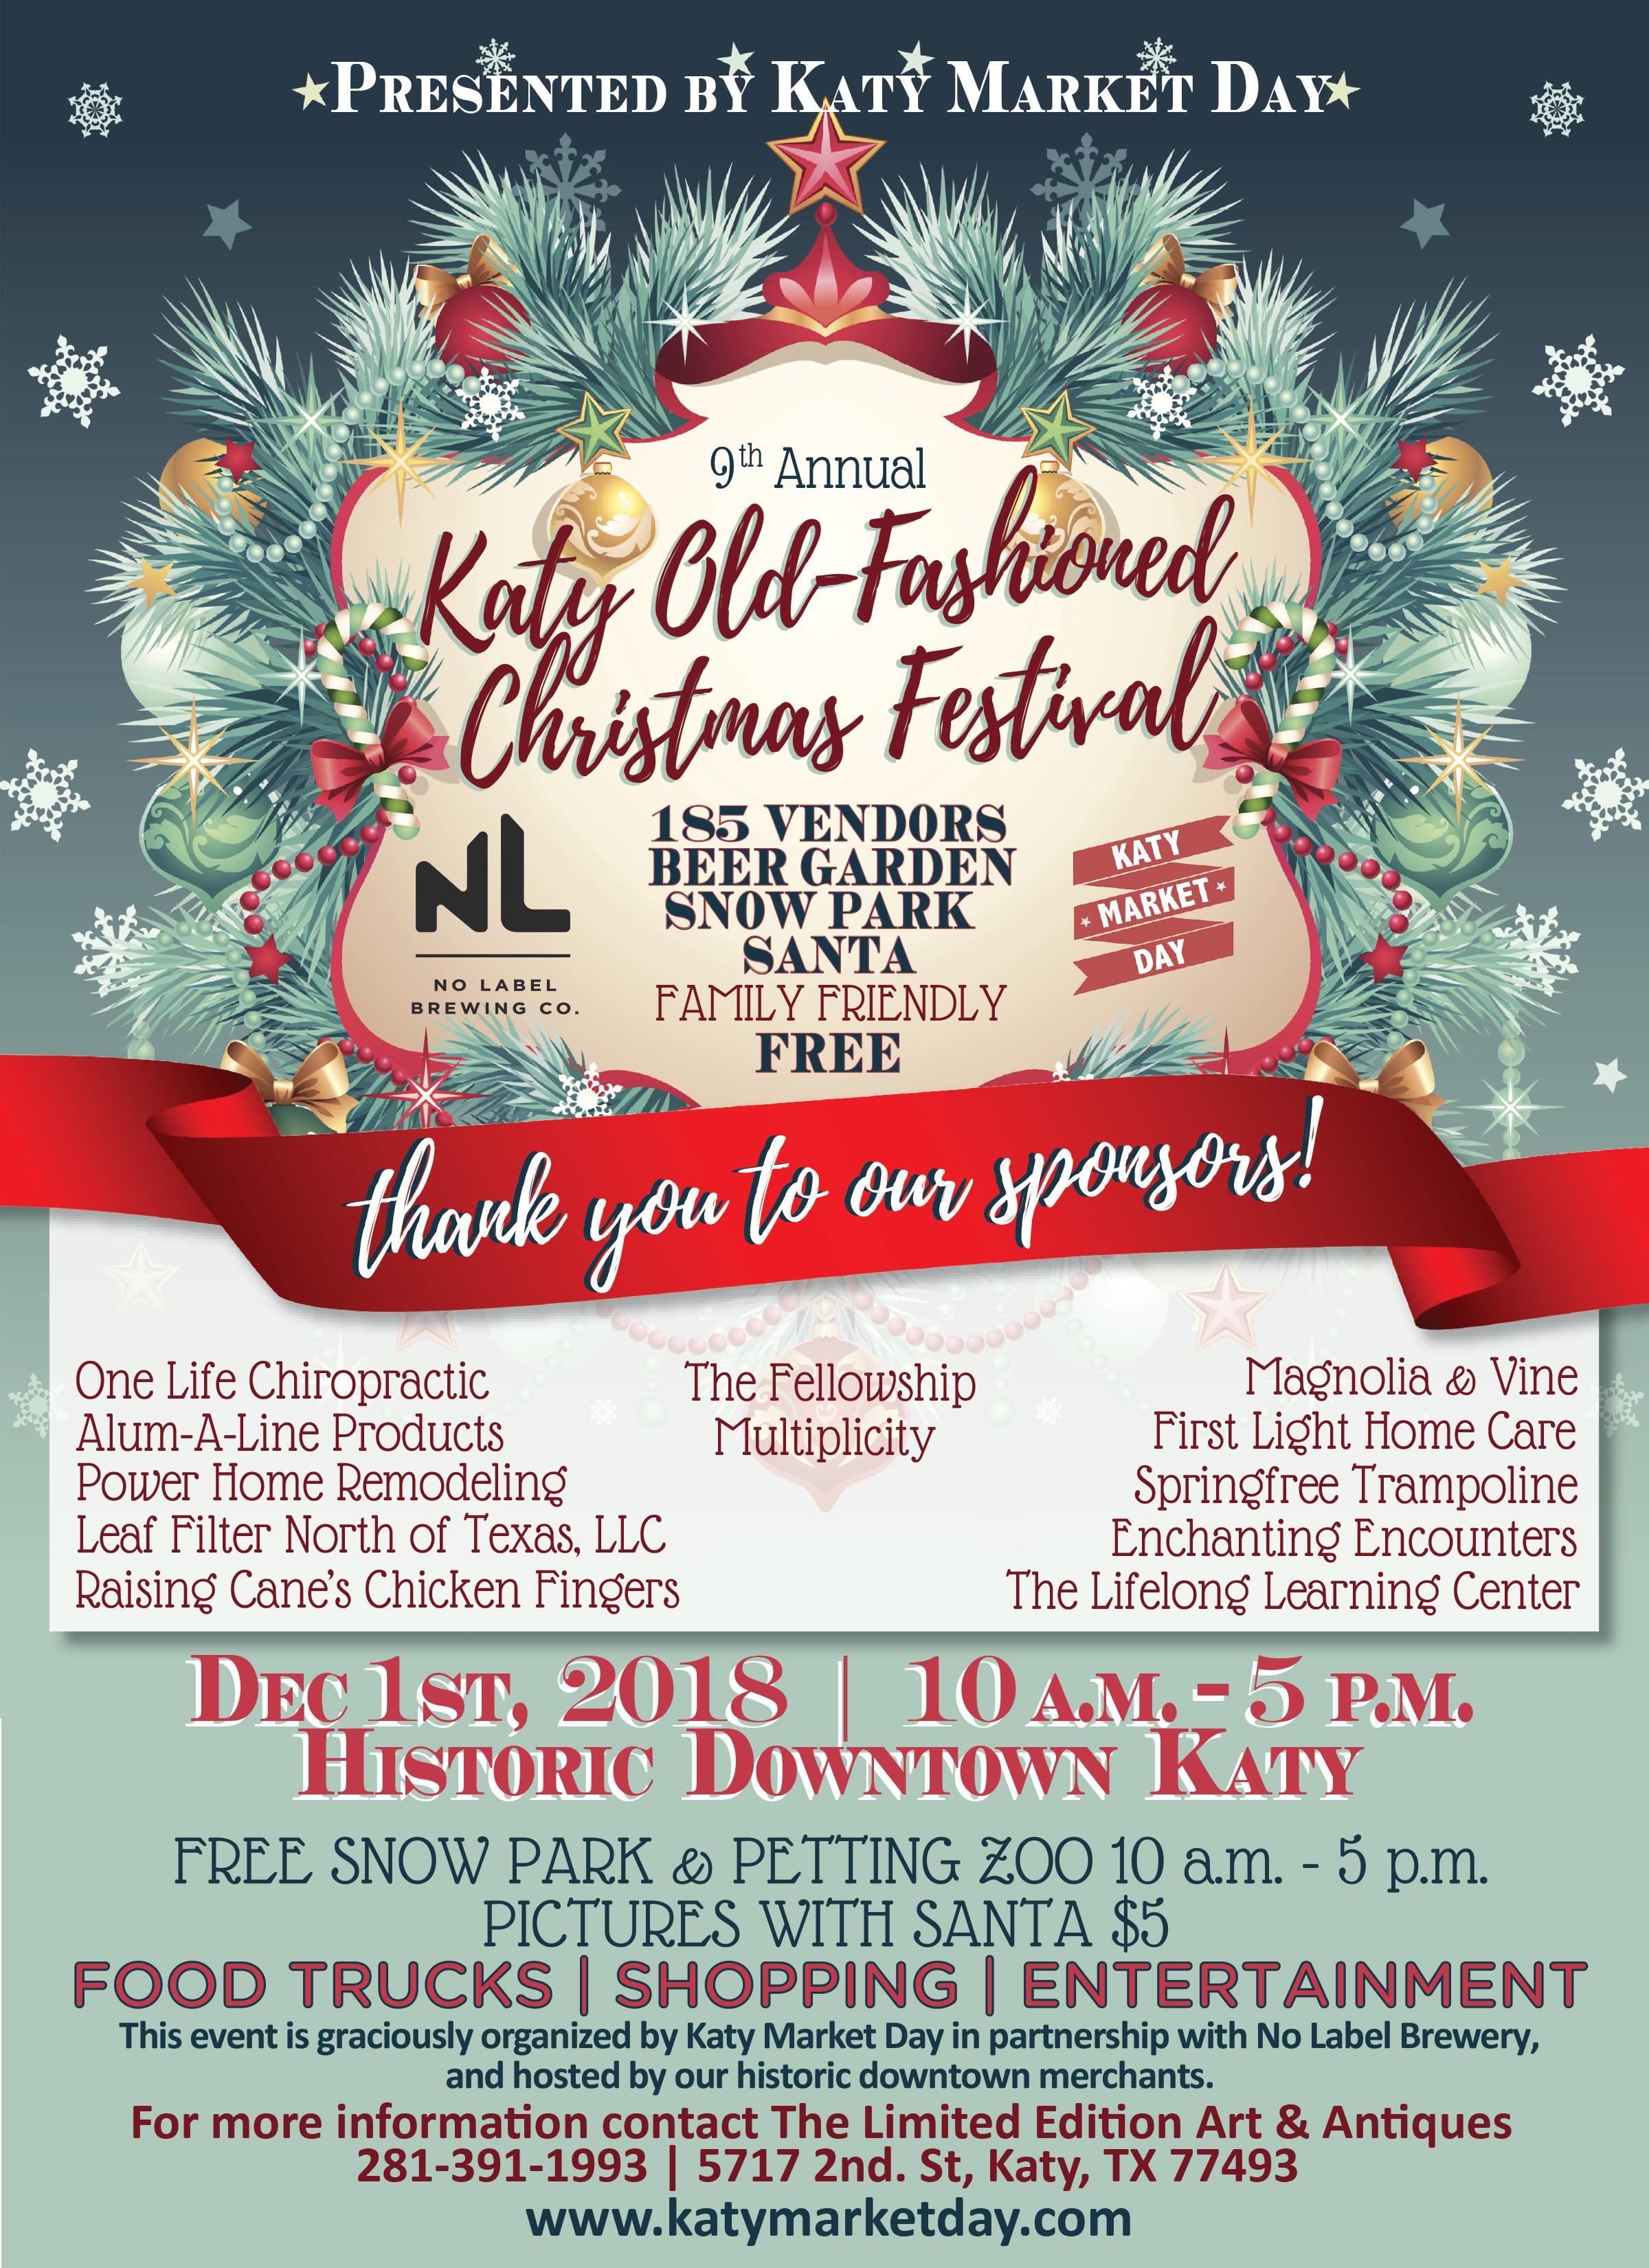 Dec 1st 2018 – Katy Old Fashioned Christmas Festival – Katy Market Day